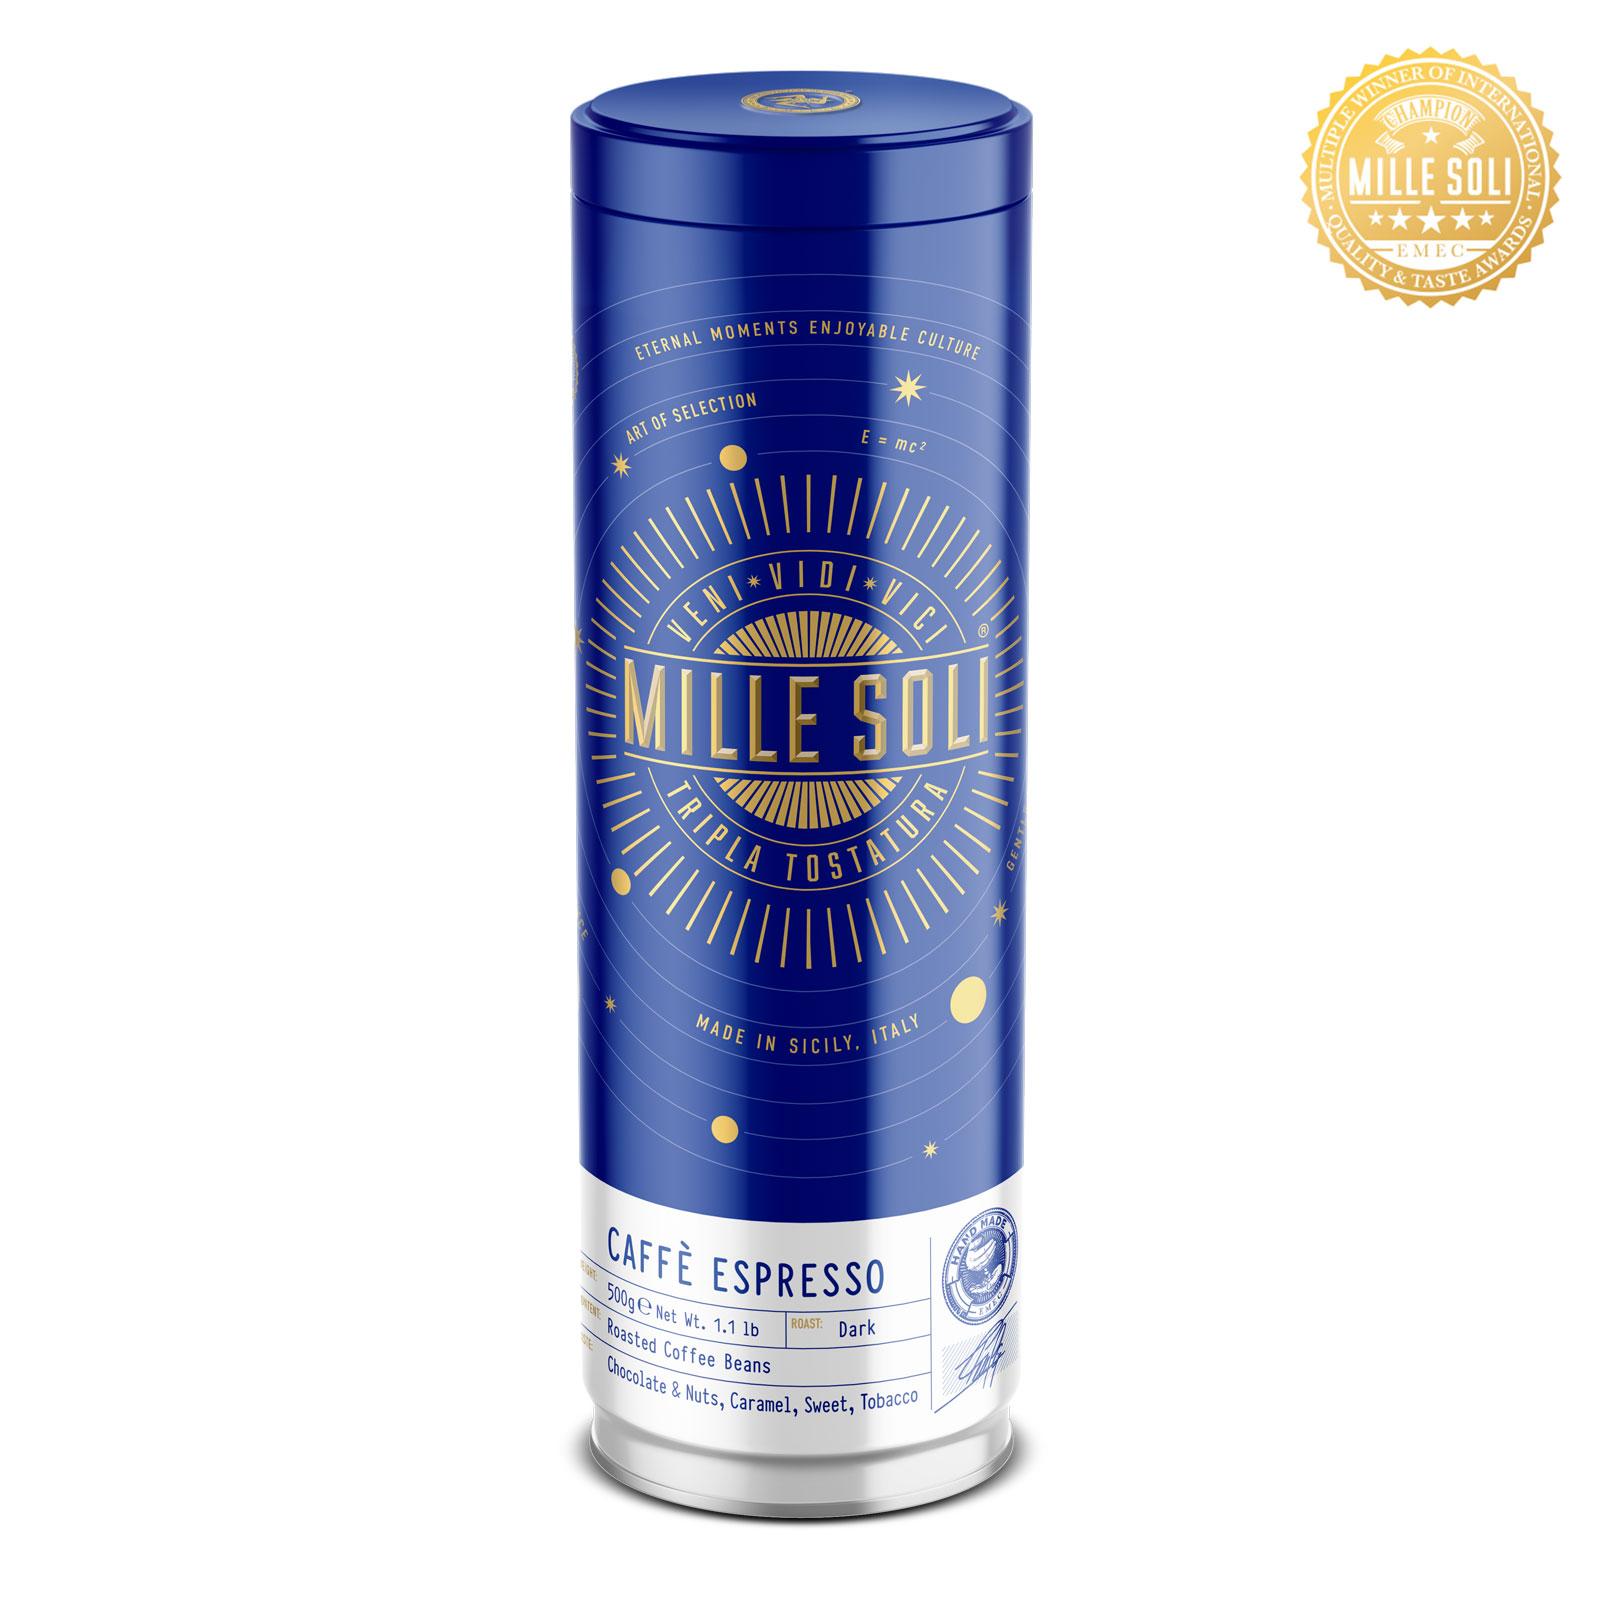 MILLE SOLI - Caffè Espresso - 500g - Bohnen